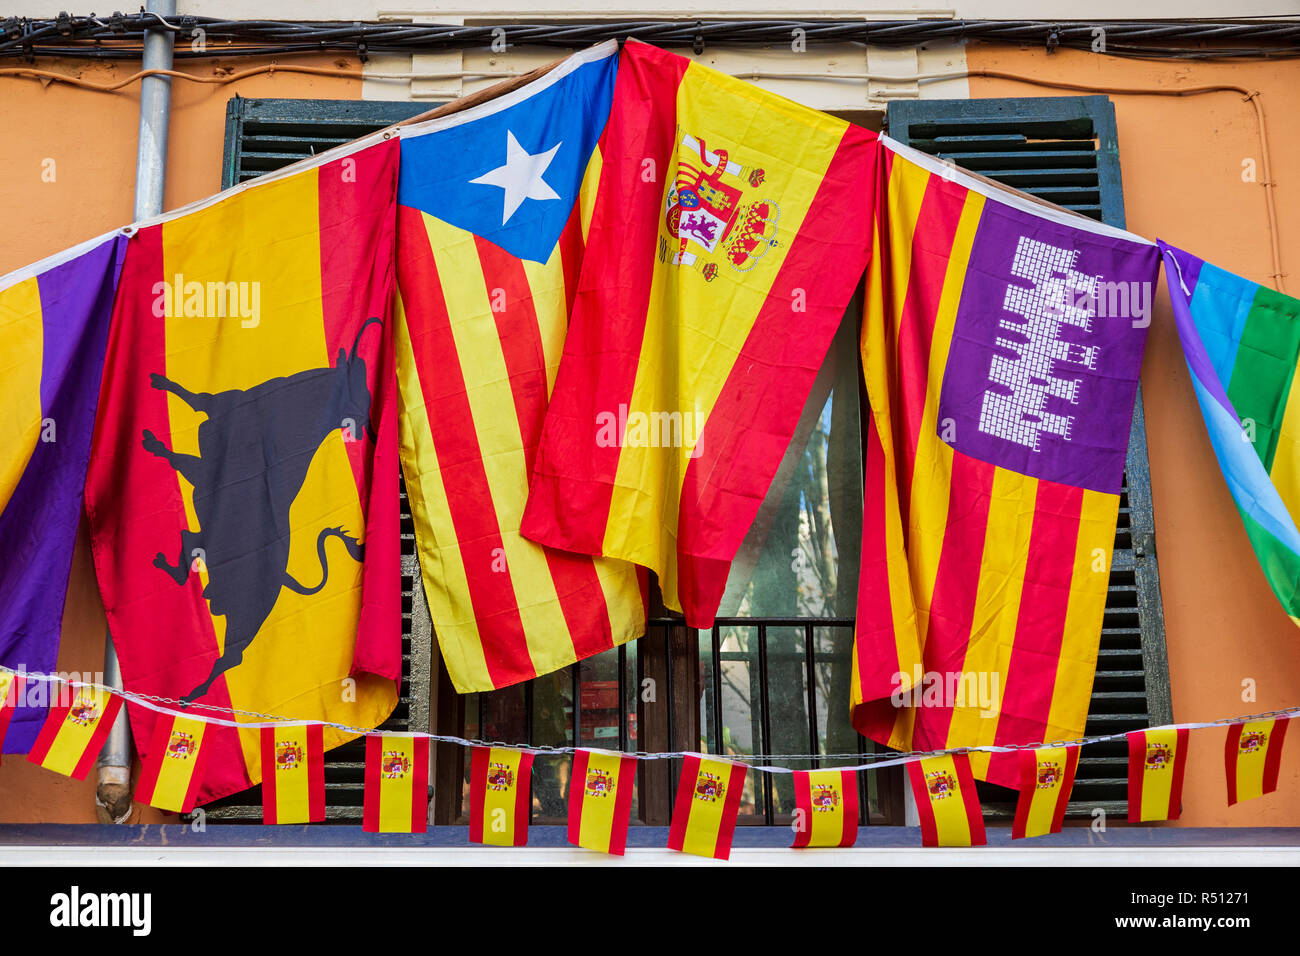 spanische flaggen die katalanische